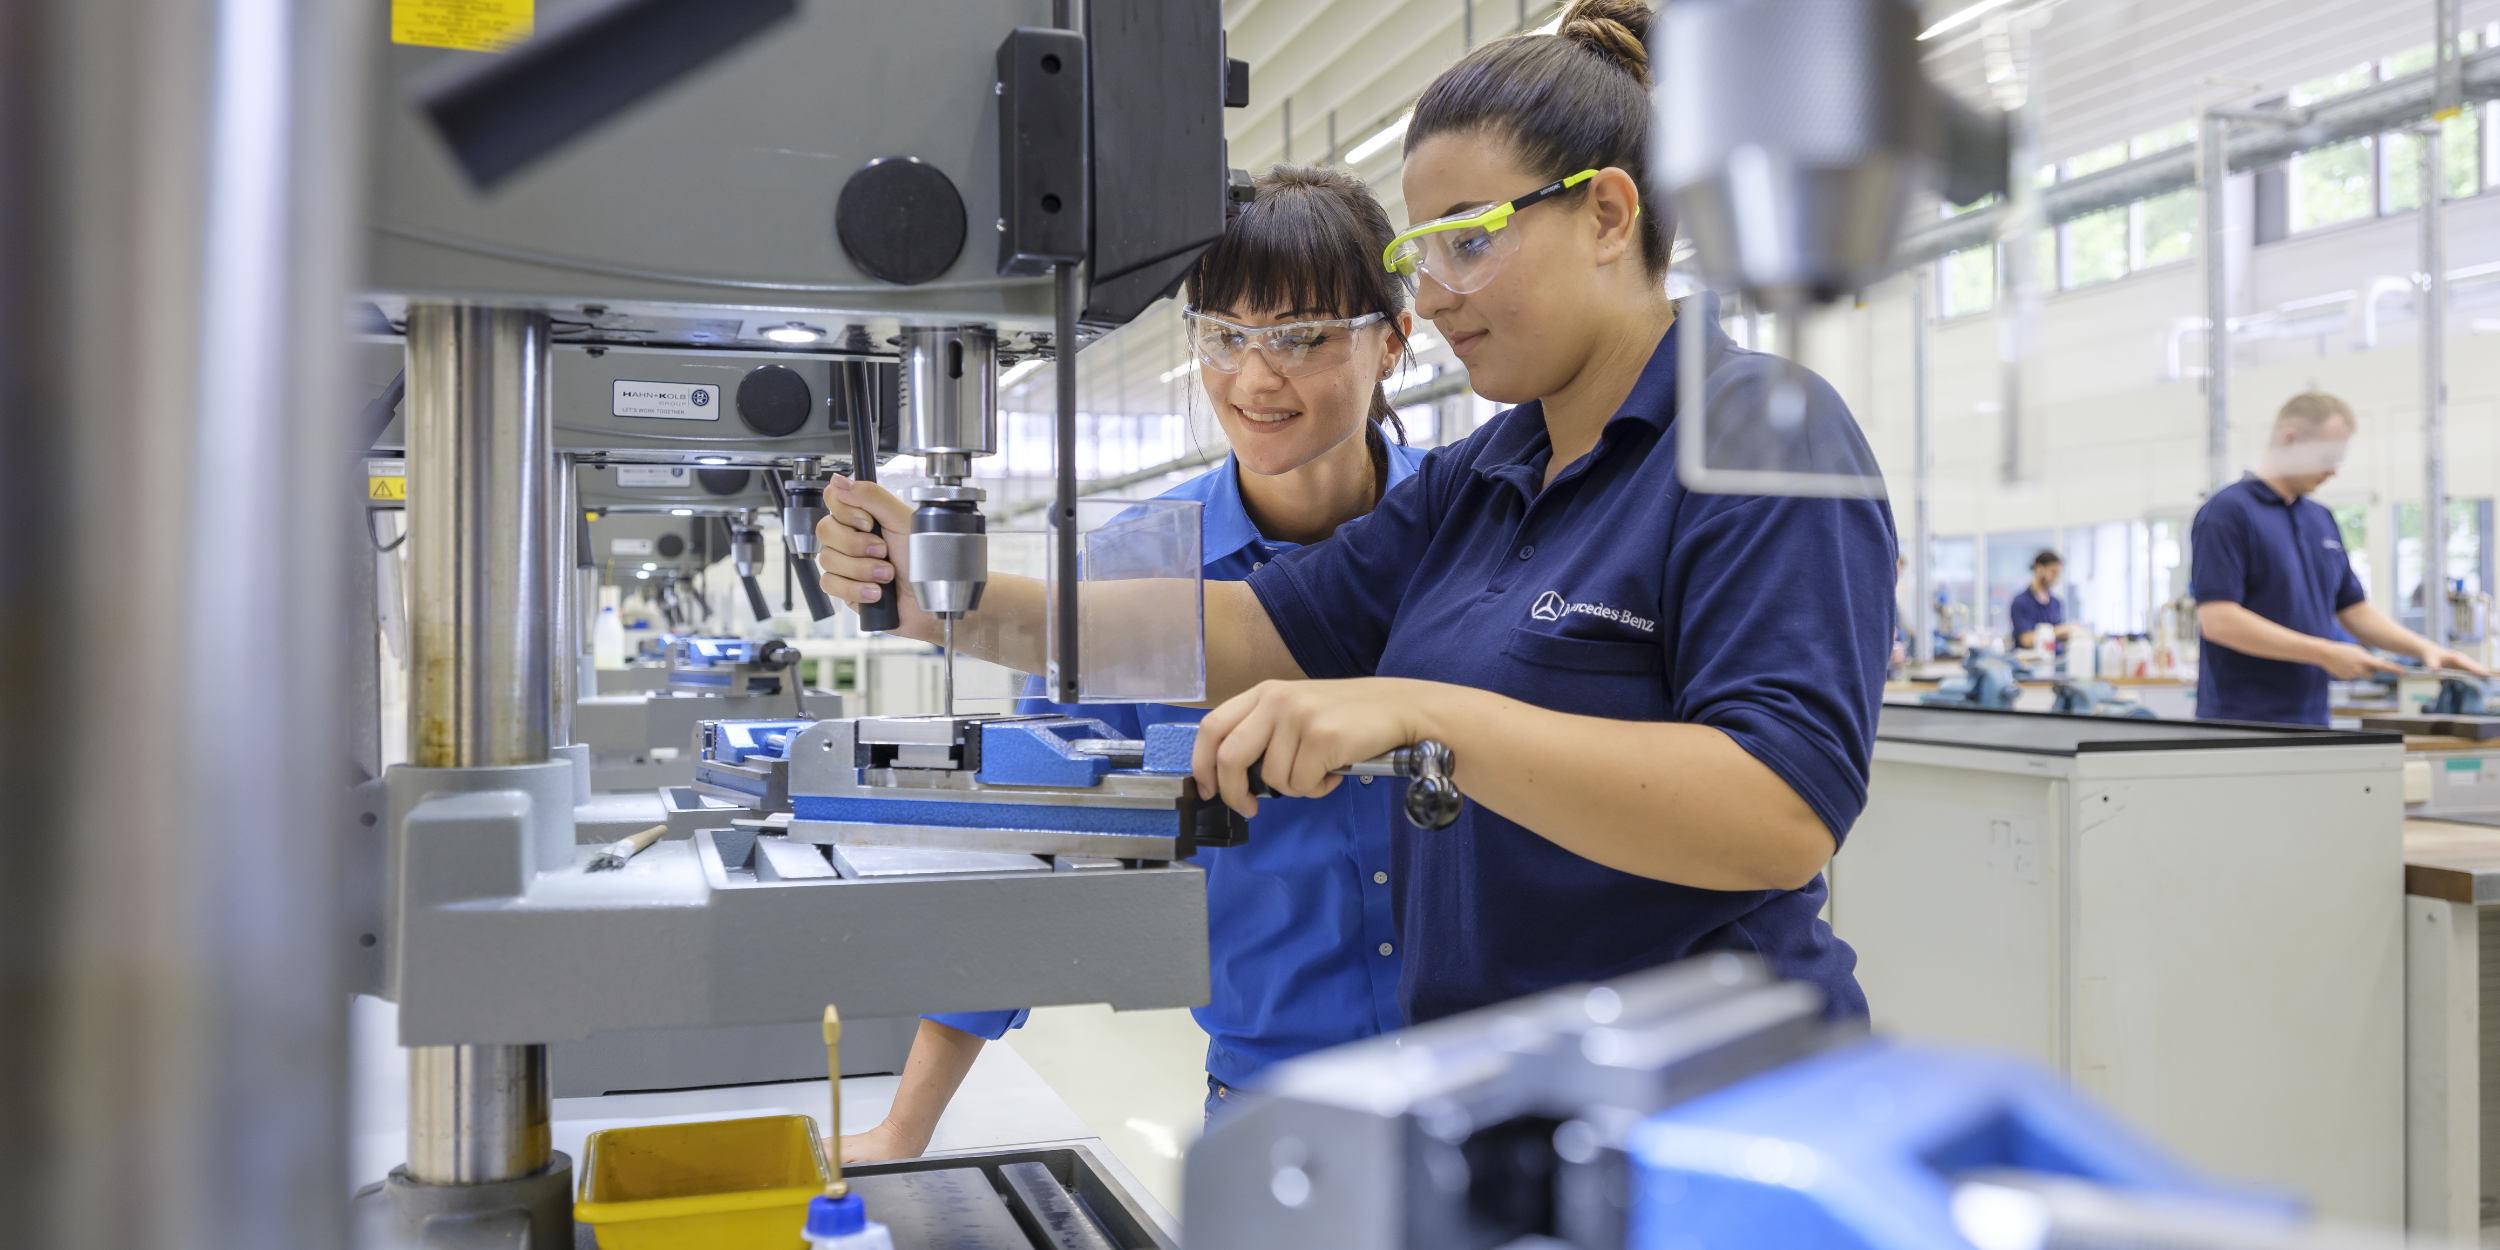 Mercedes Benz AZUBI Kampagne Stuttgart Bohren Auszubildender Ausbilder Bohrmaschine bohren zerspanen